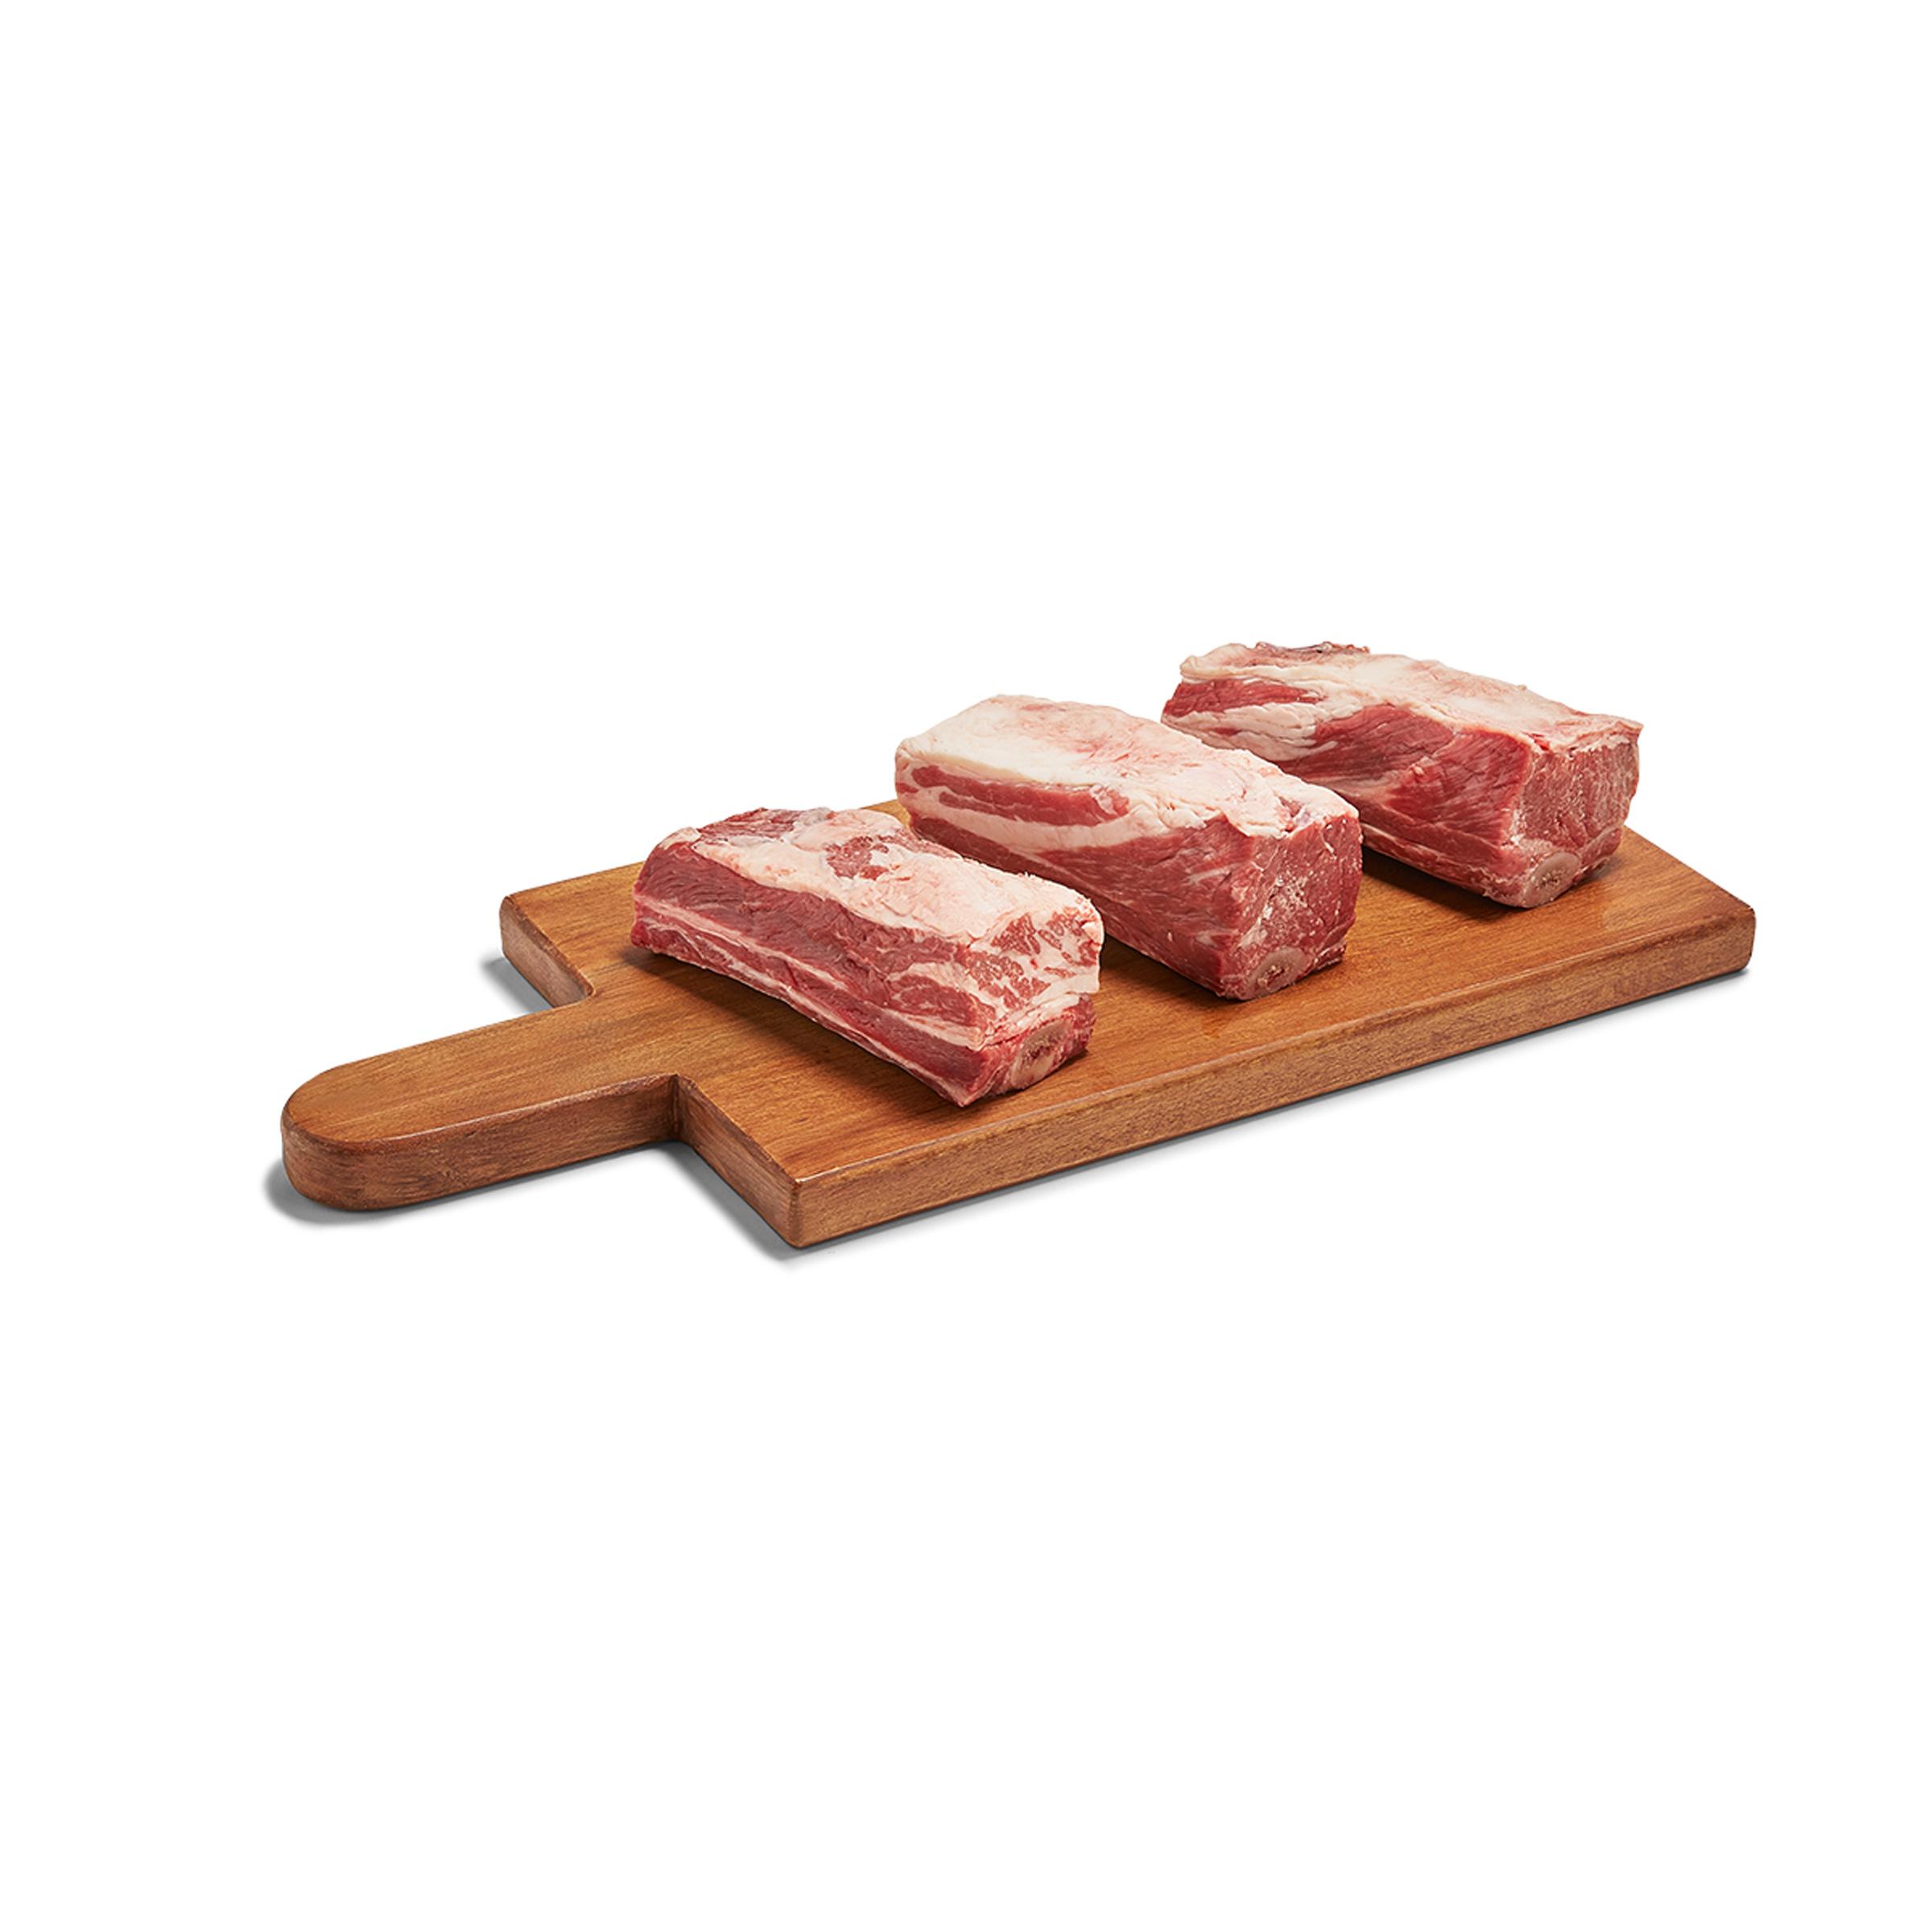 Bone In Flanken Style Beef Short Ribs 1 Lb Hearst Ranch Whole Foods Market